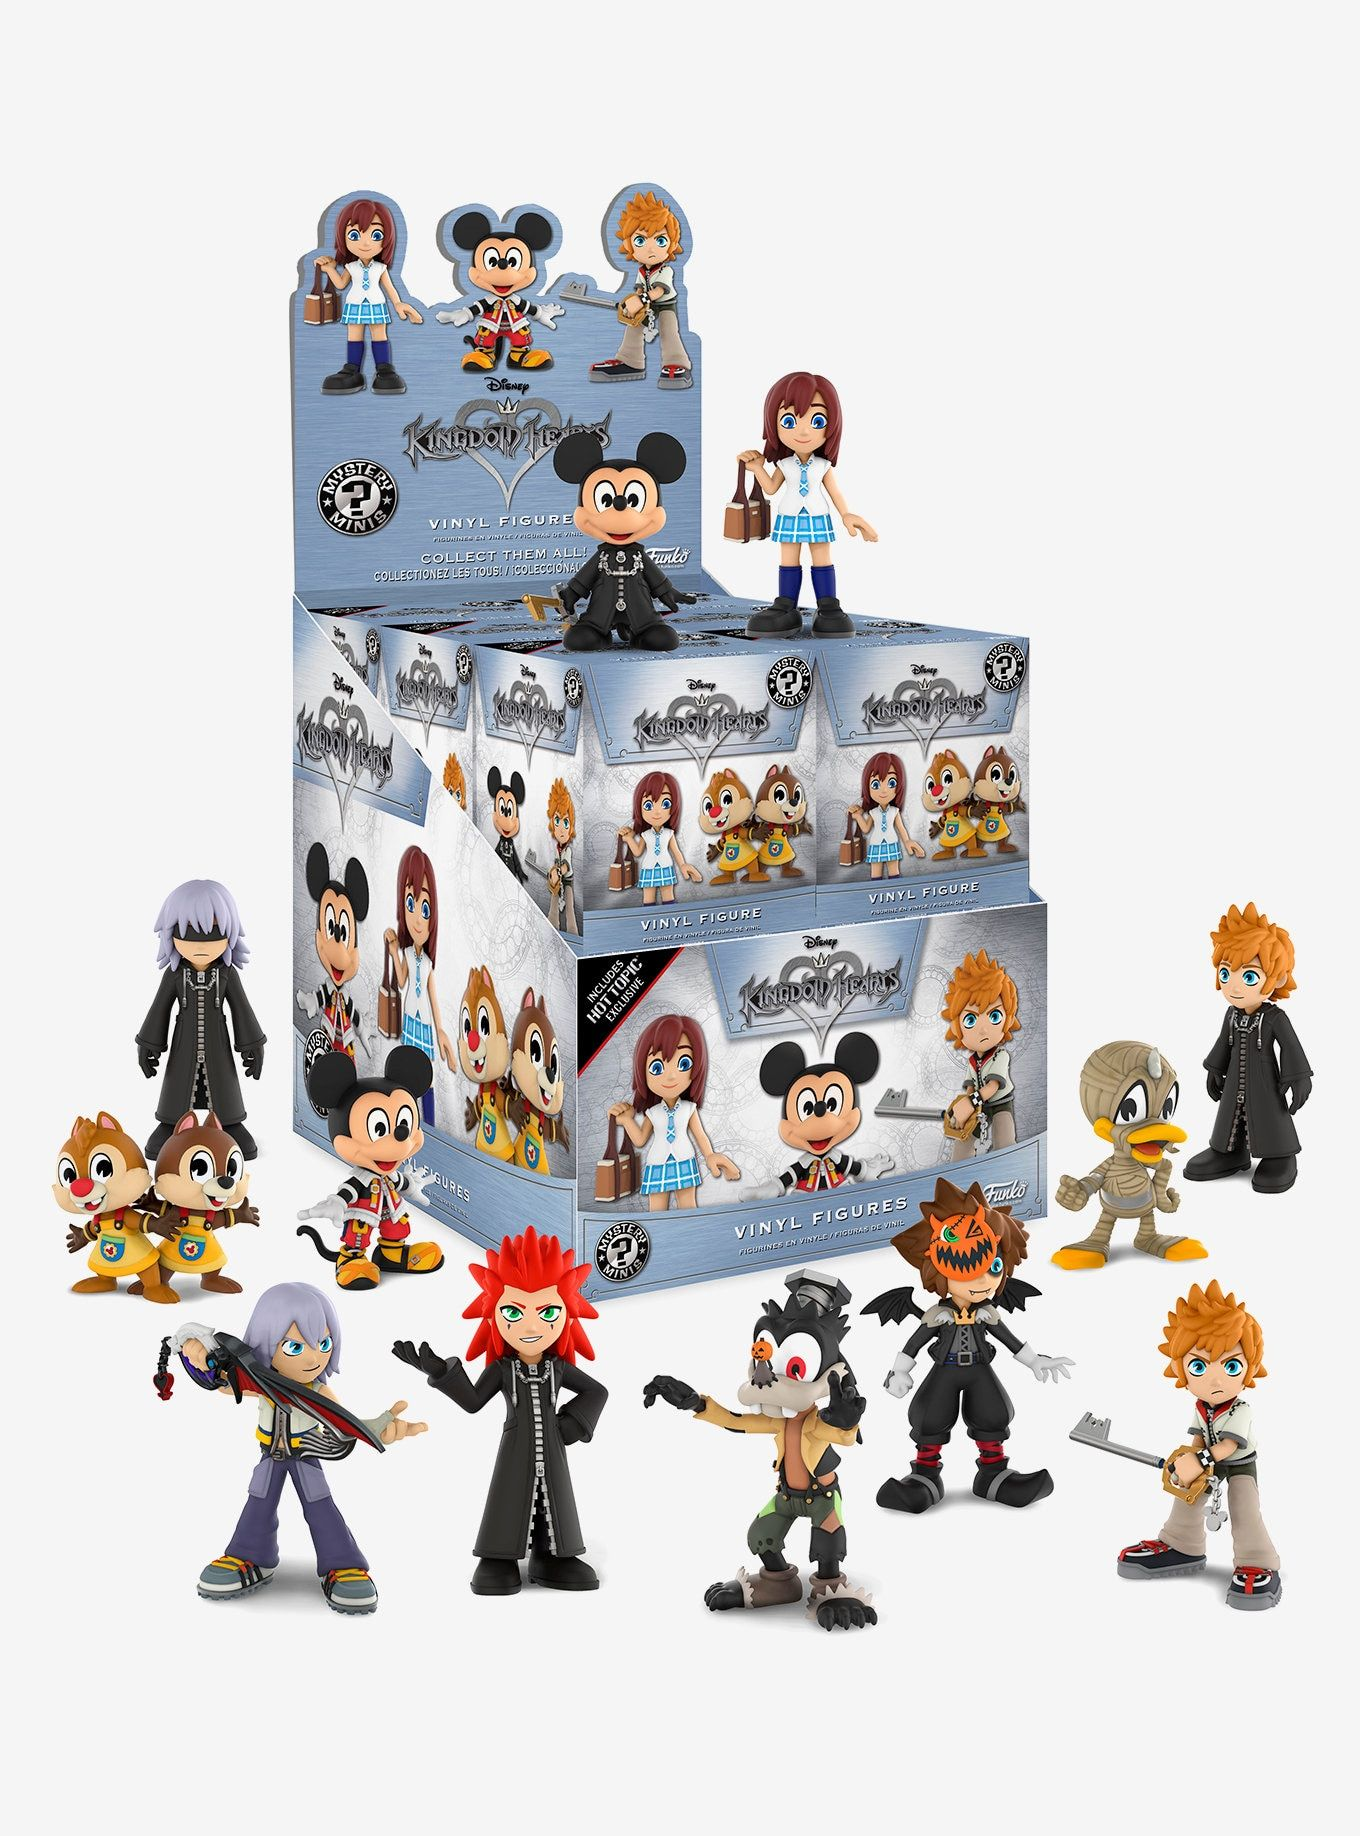 Funko Disney Kingdom Hearts Mystery Minis Blind Box Figure Hot Topic Exclusive Funko Mystery Minis Mystery Minis Disney Kingdom Hearts